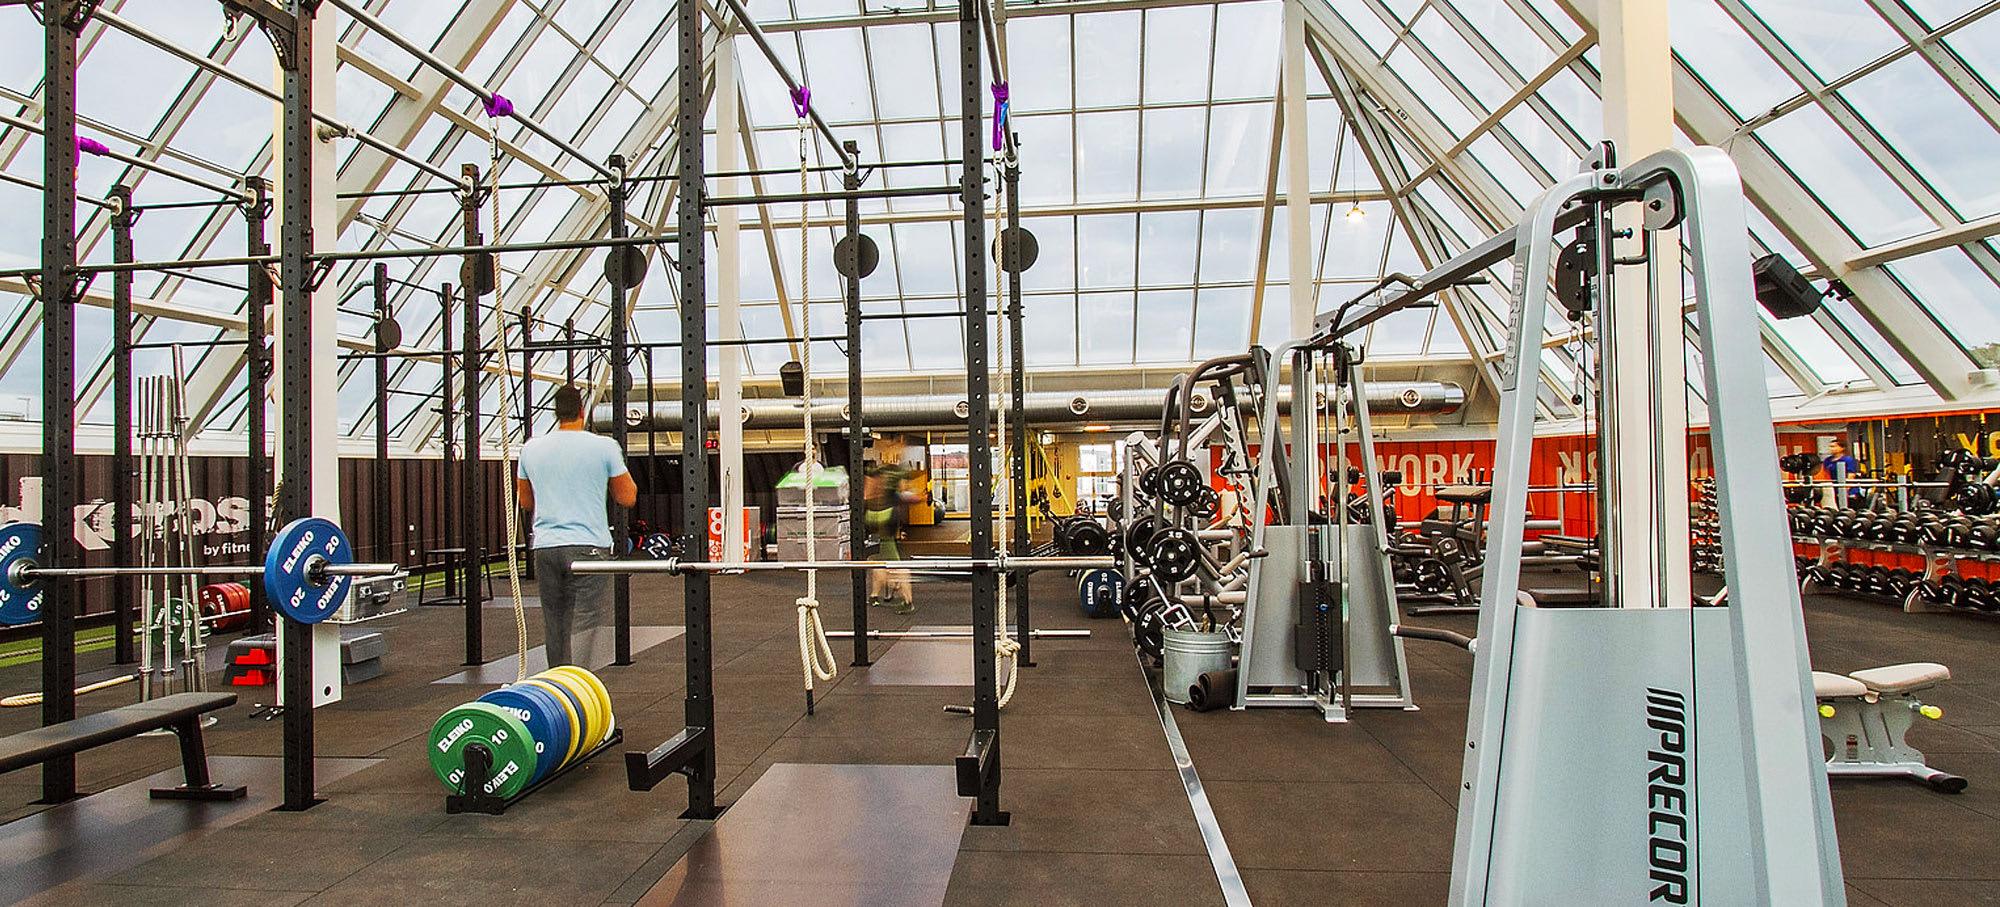 viby sjælland fitness